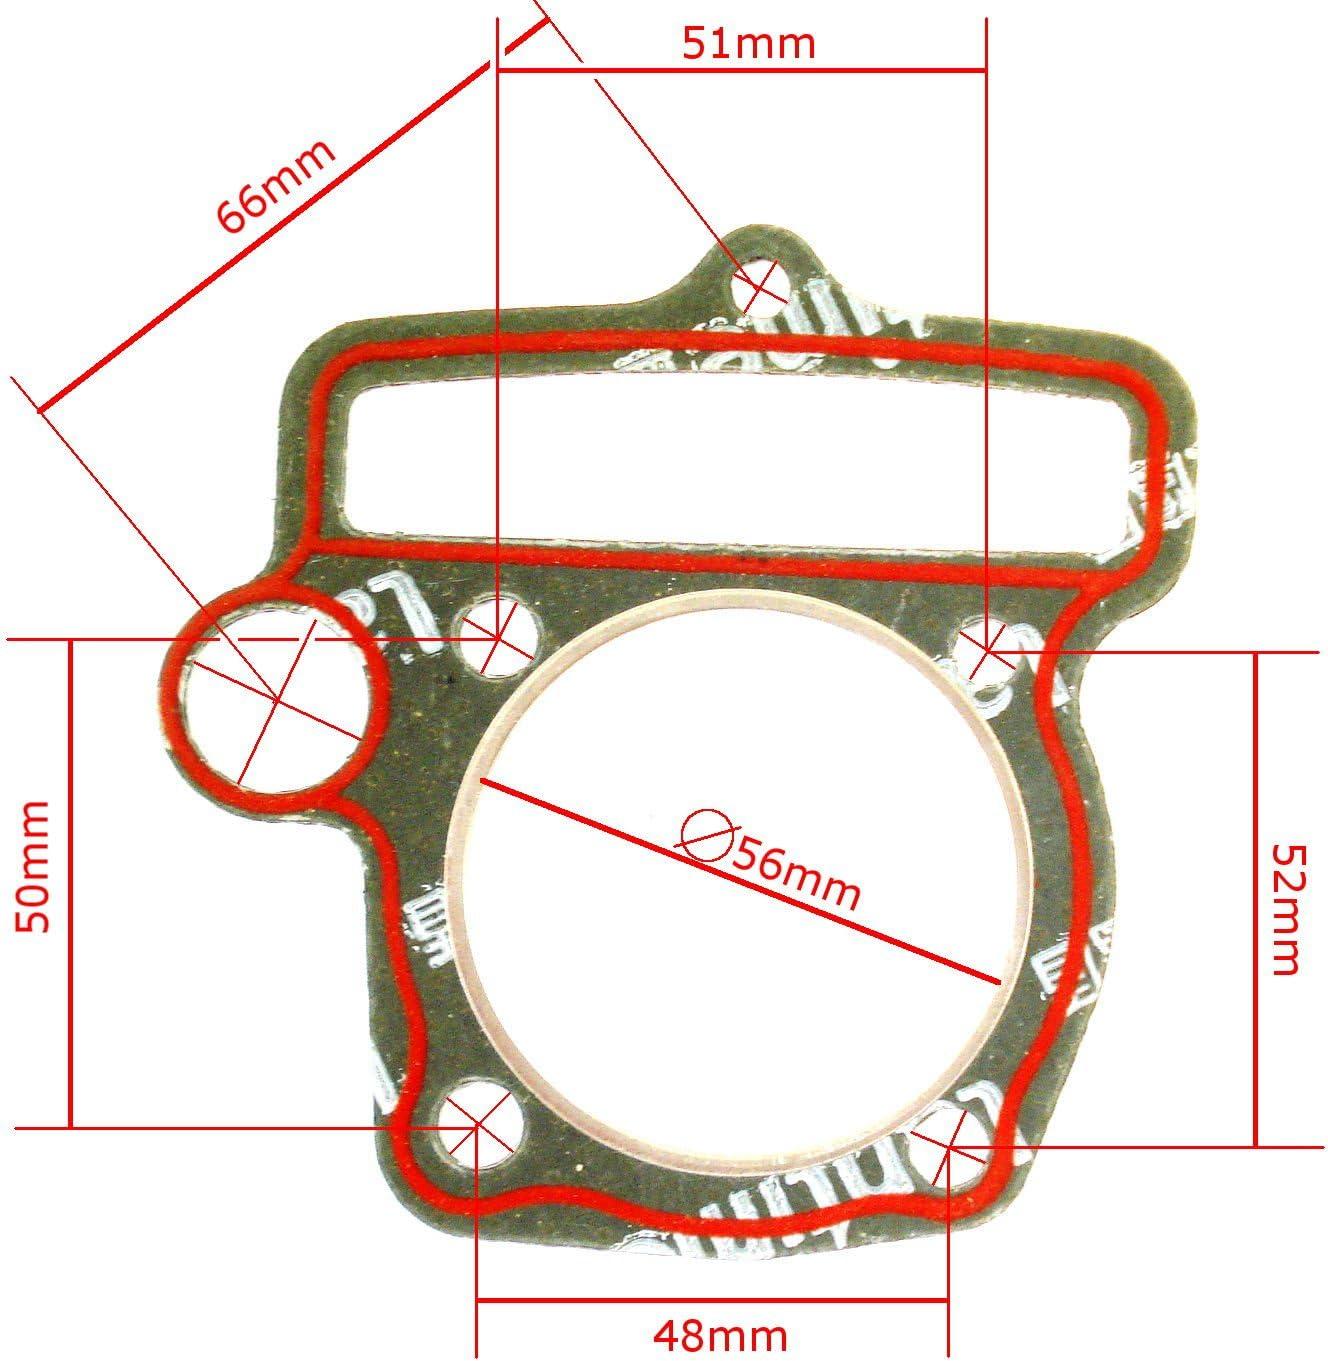 Hmparts Motordichtsatz Motordichtungssatz Yx 140 Ccm Lk Dirt Pit Bike Quad Auto